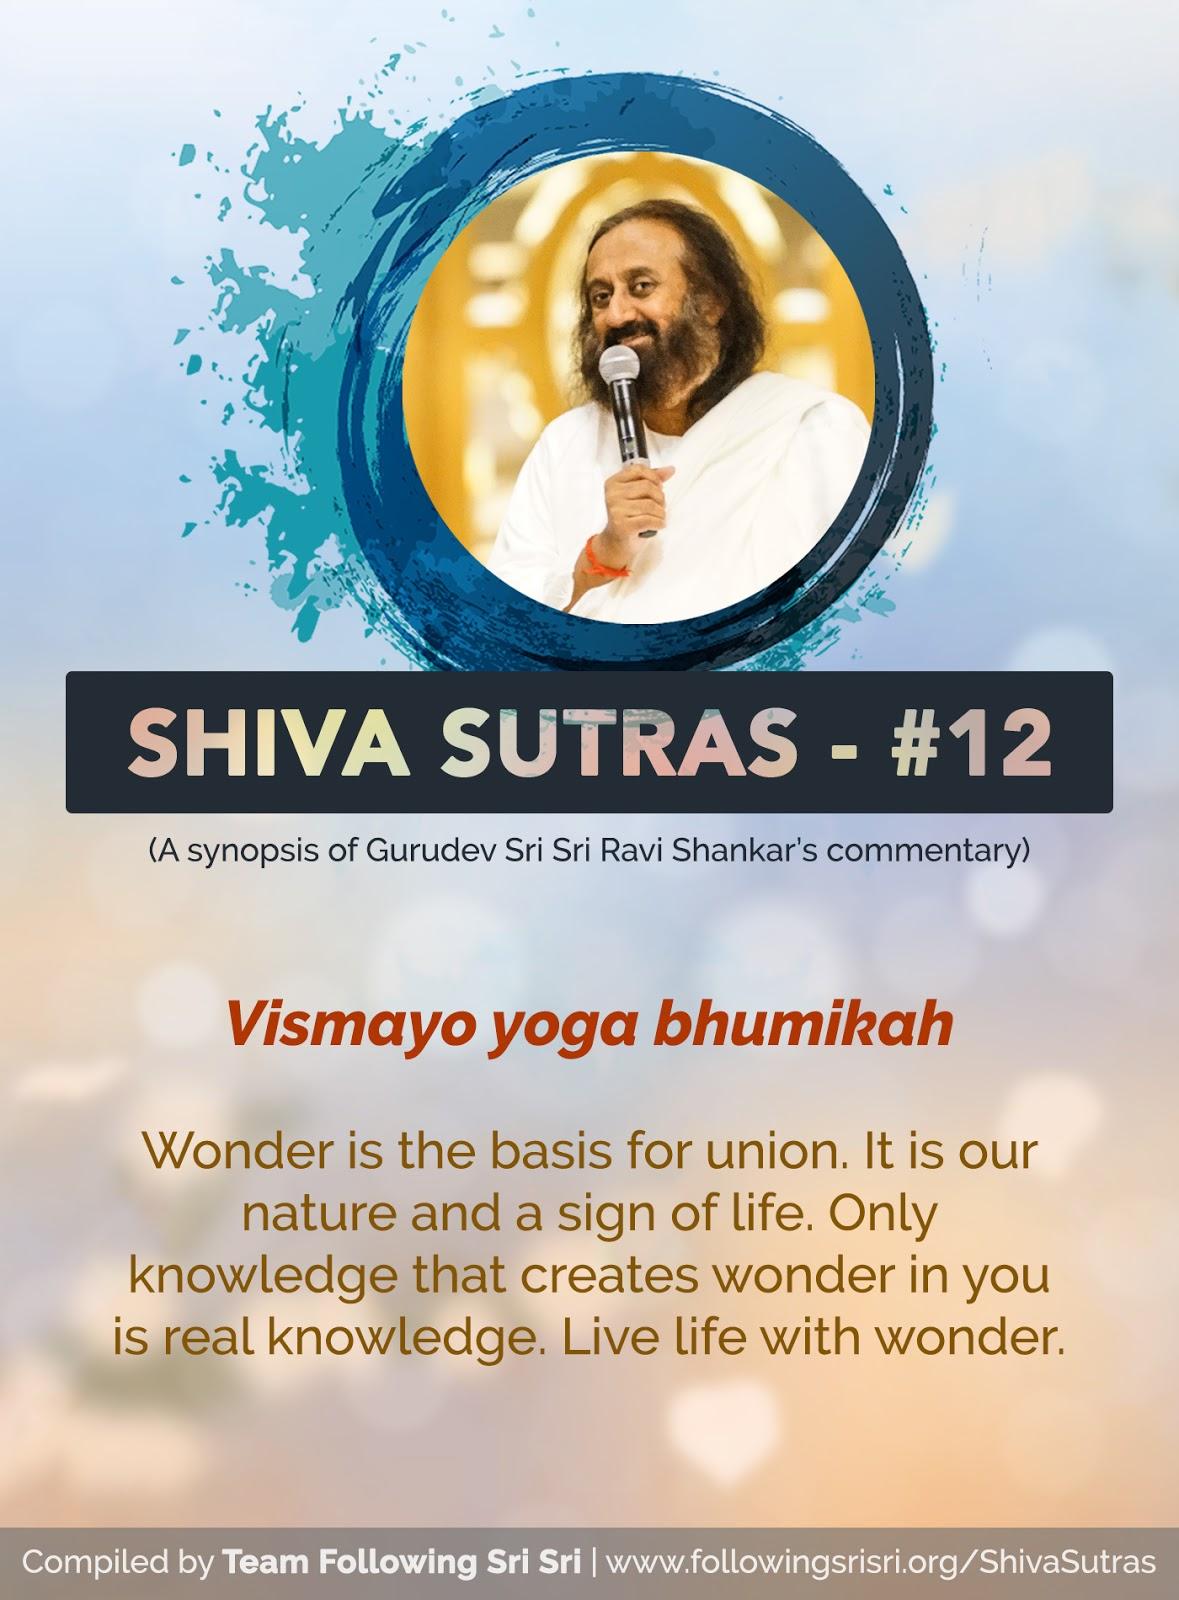 Shiva Sutras - Sutra 12